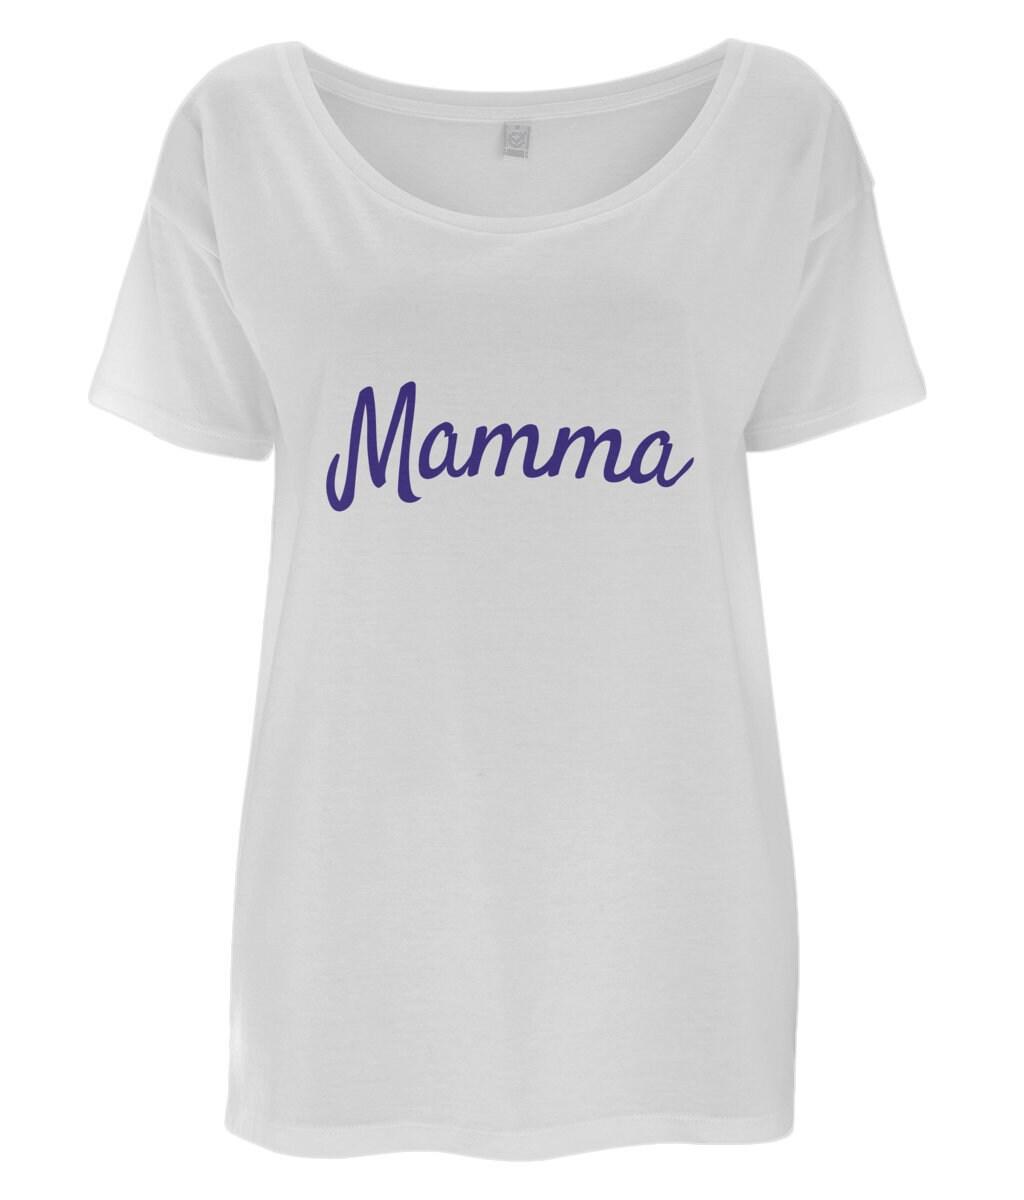 213faeb0956 Mamma Italian Slogan Women s Tencel Blend Oversized